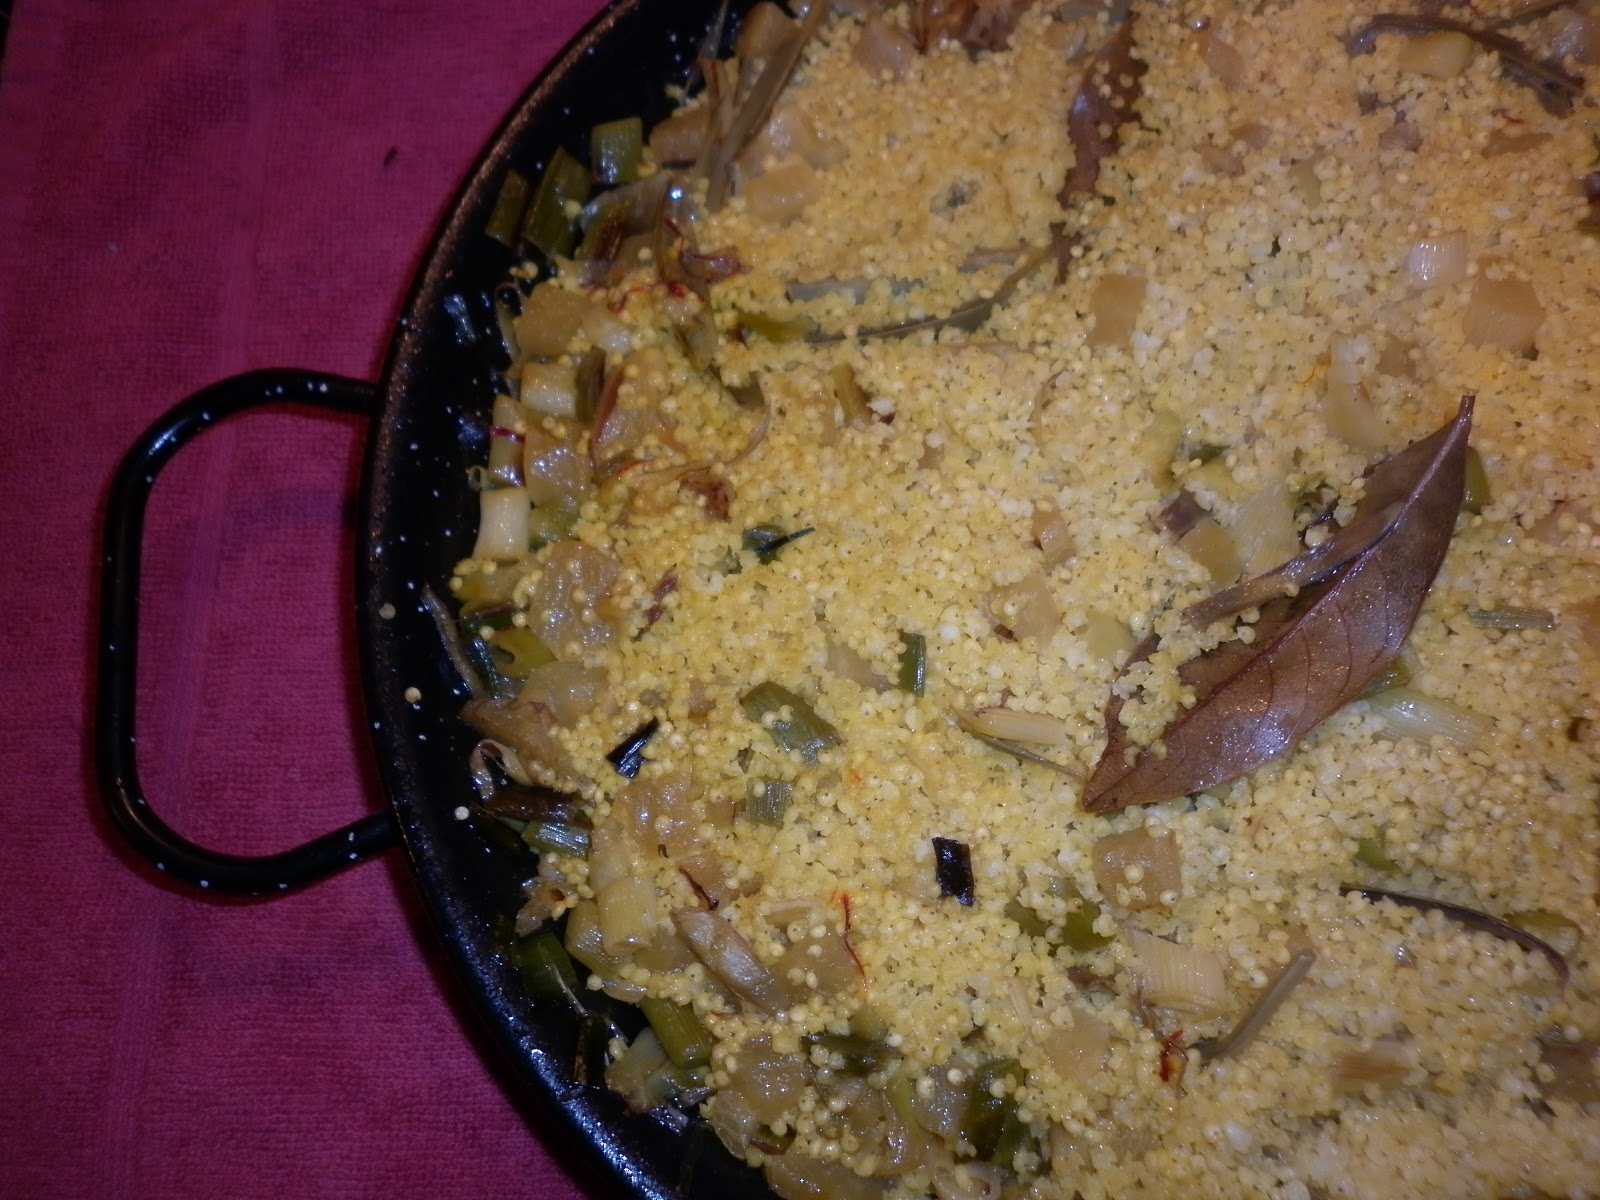 Cocina macrobi tica paella de mijo for Cocina macrobiotica